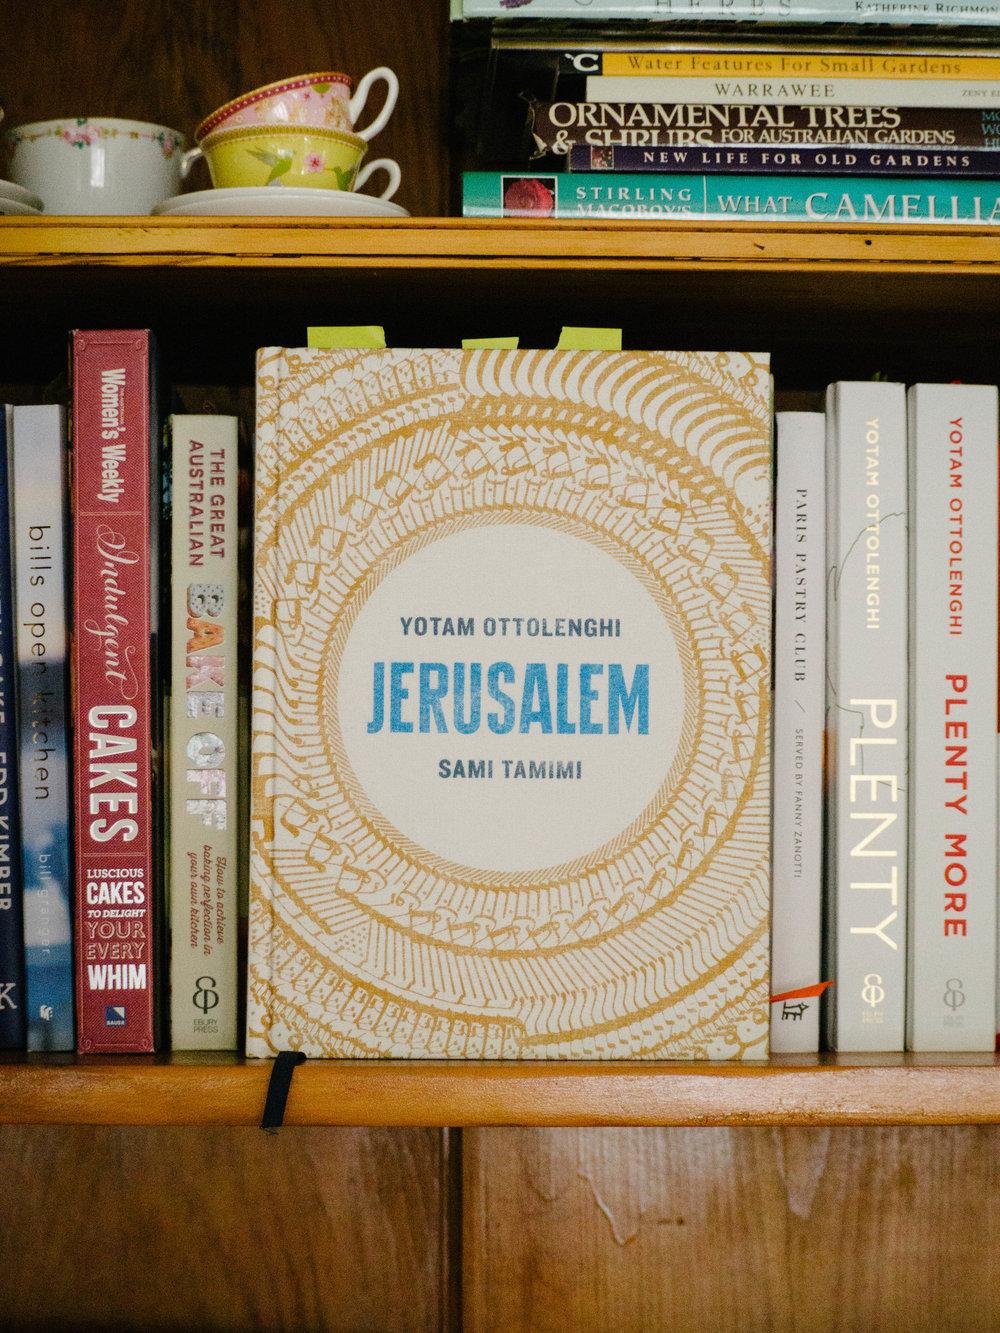 Jerusalem  by Yotam Ottolenghi & Sami Tamimi